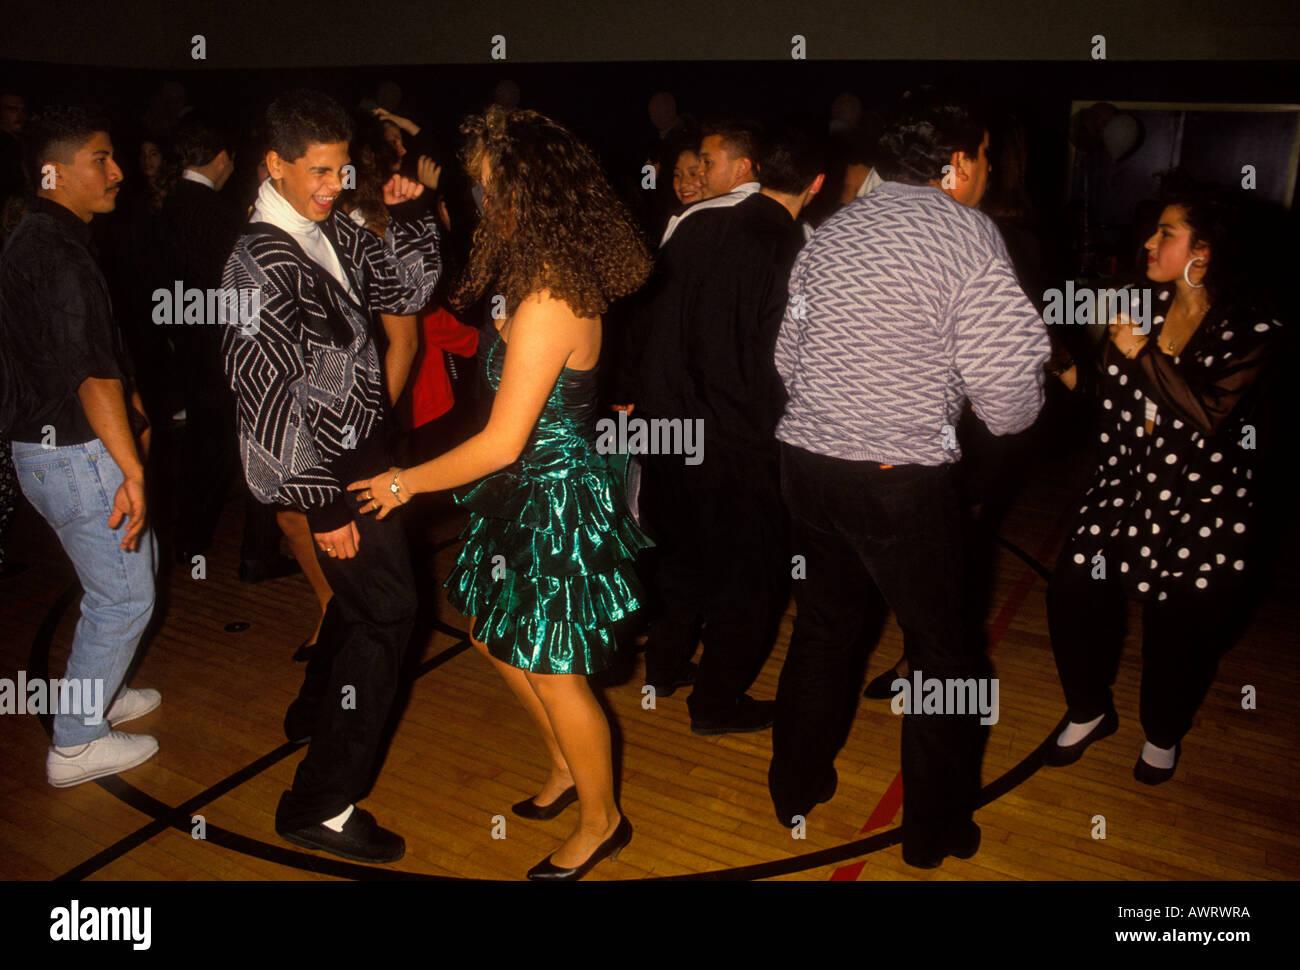 Teen photo of girls dancing, cina xxx hot